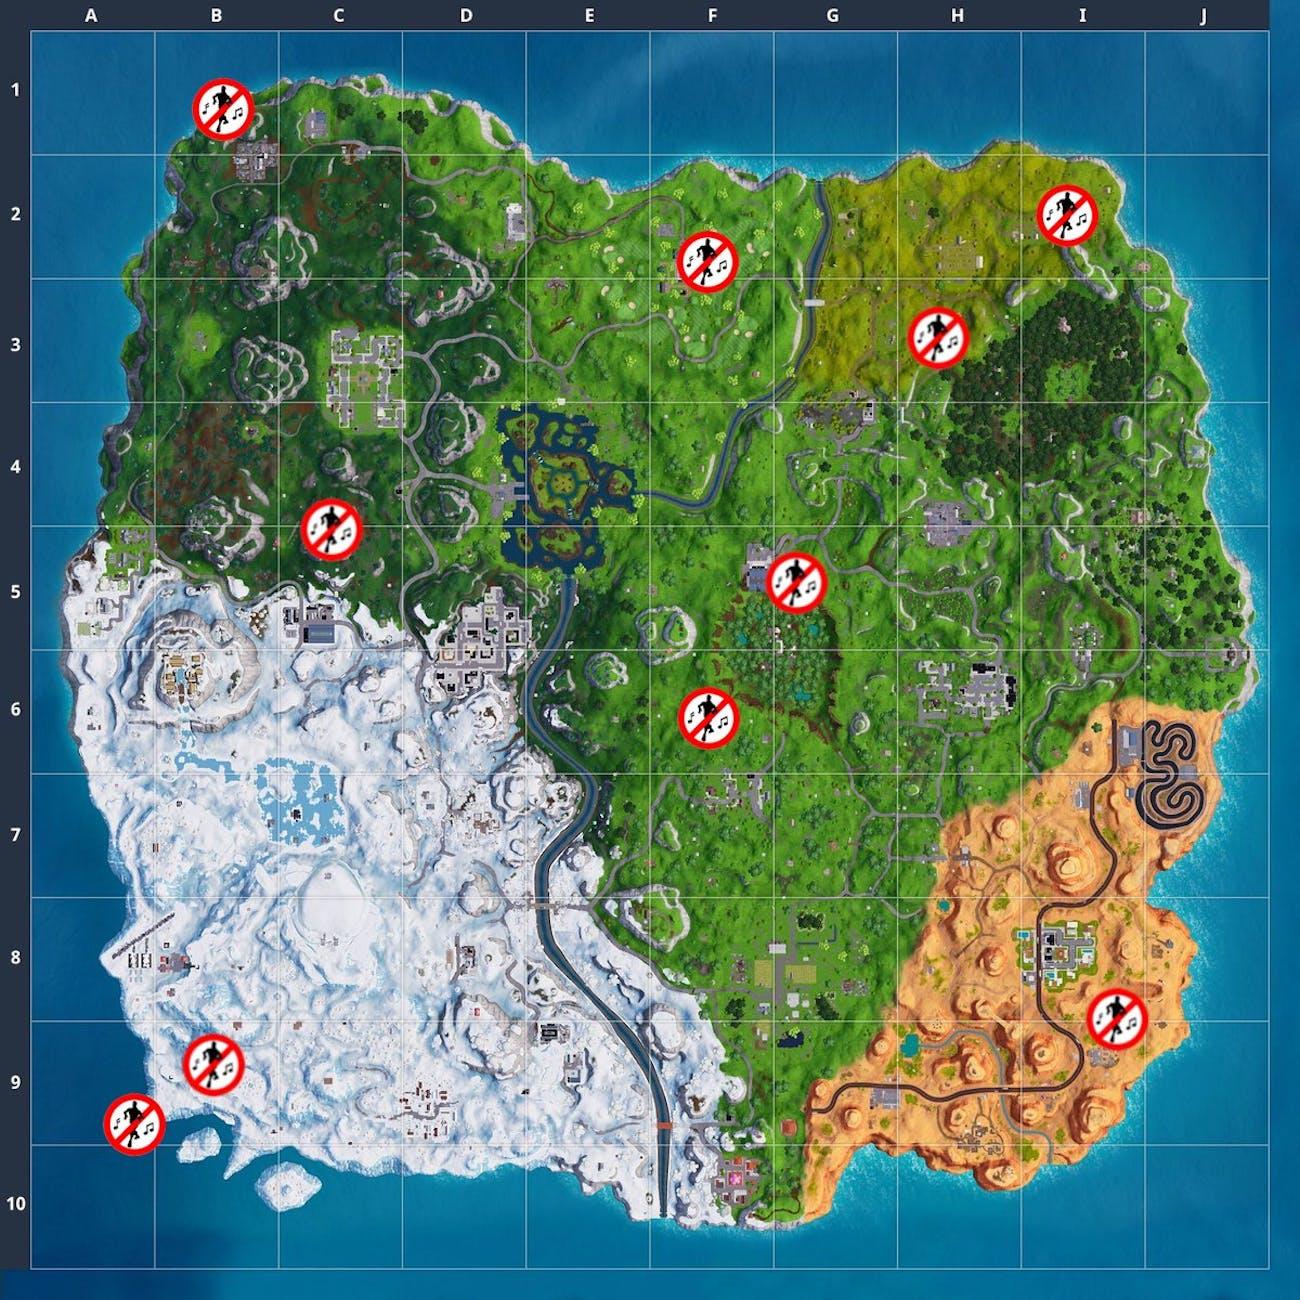 'Fortnite' Forbidden Dance Locations